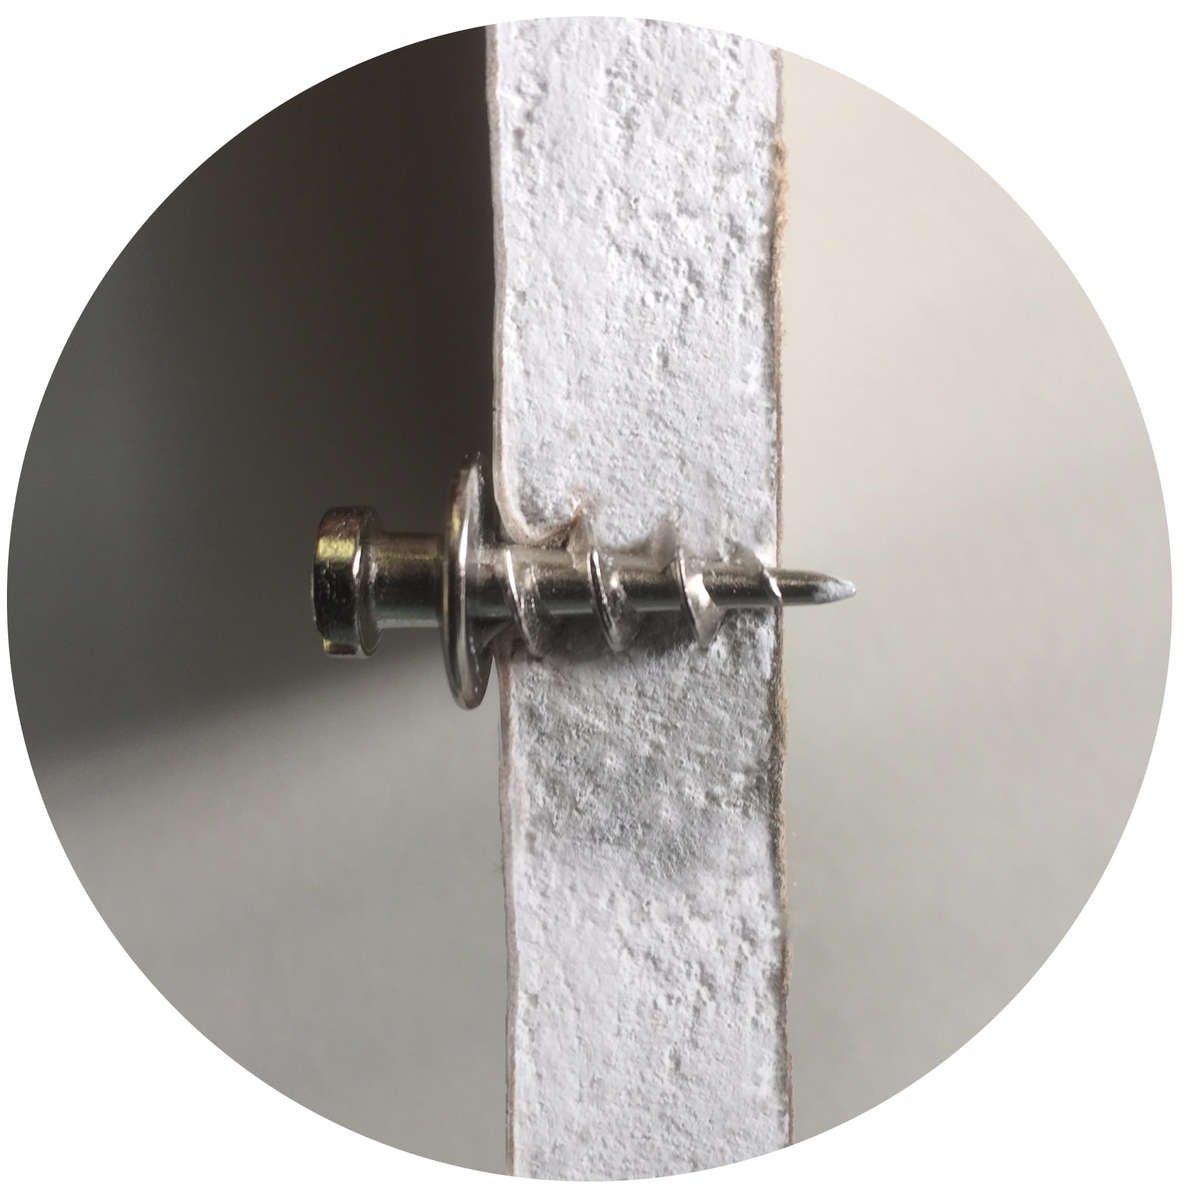 Deco Screws won't puncture wiring or plumbing